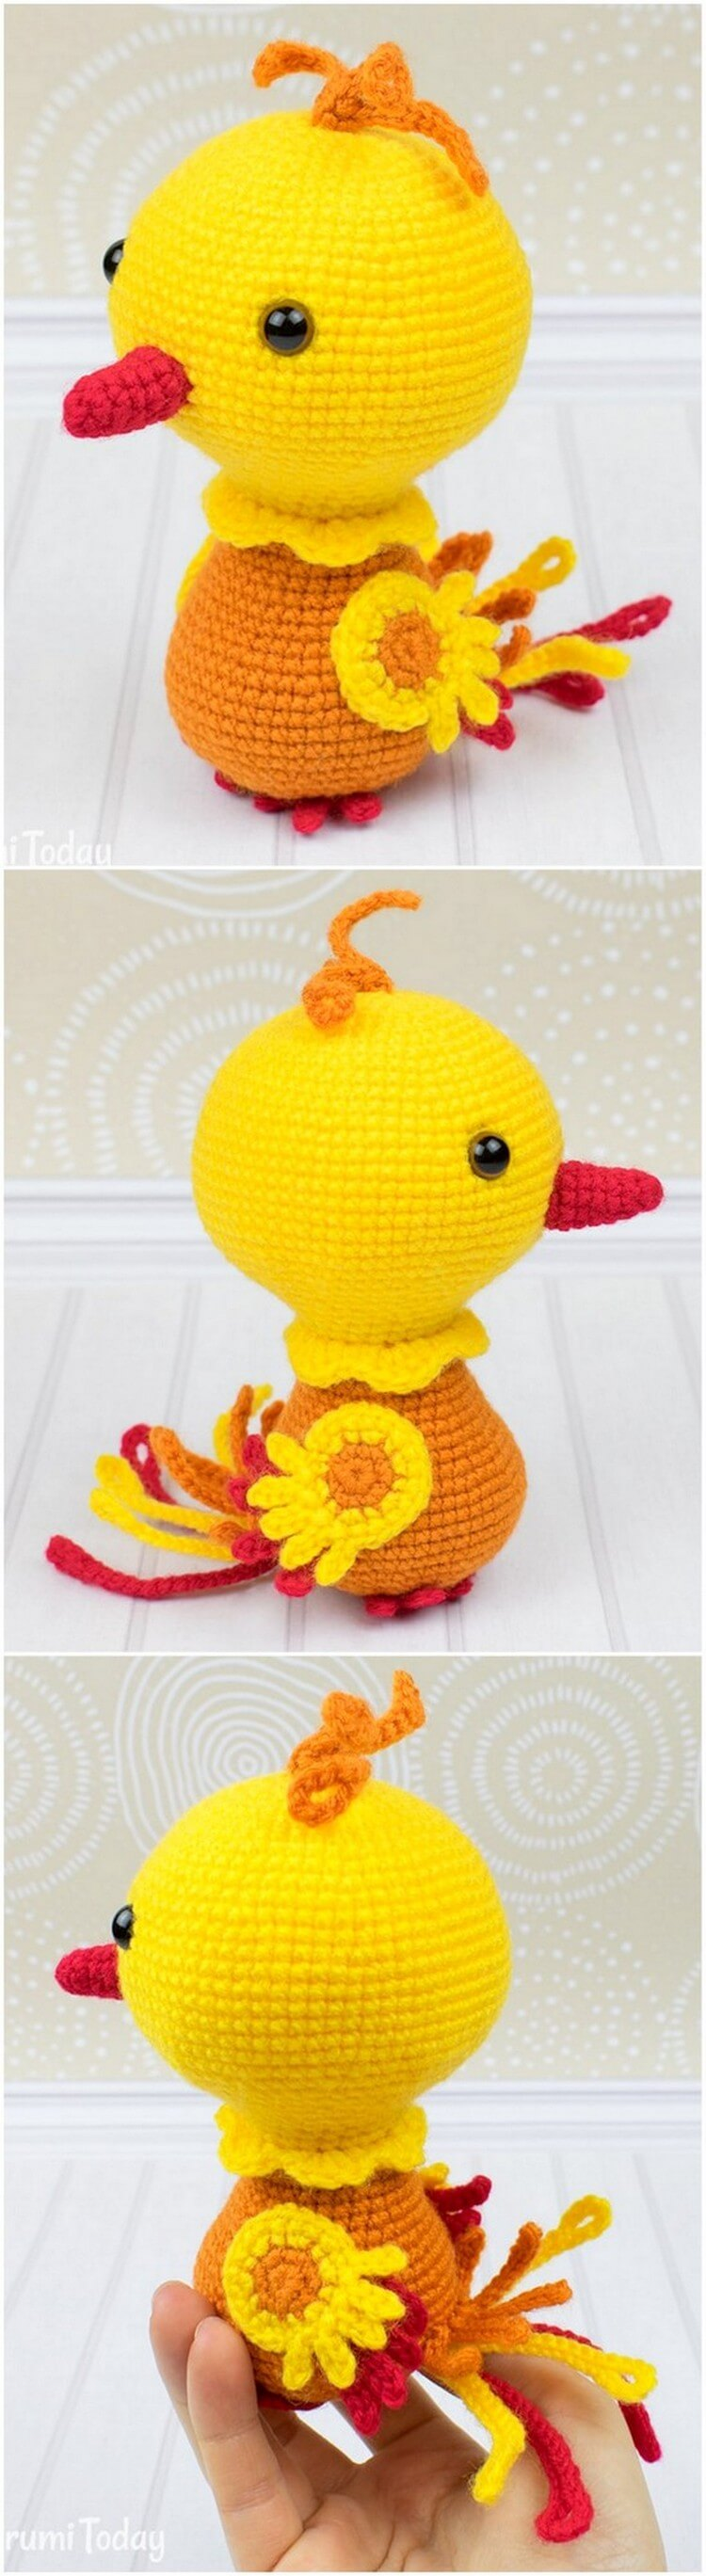 Crochet Amigurumi Pattern (64)